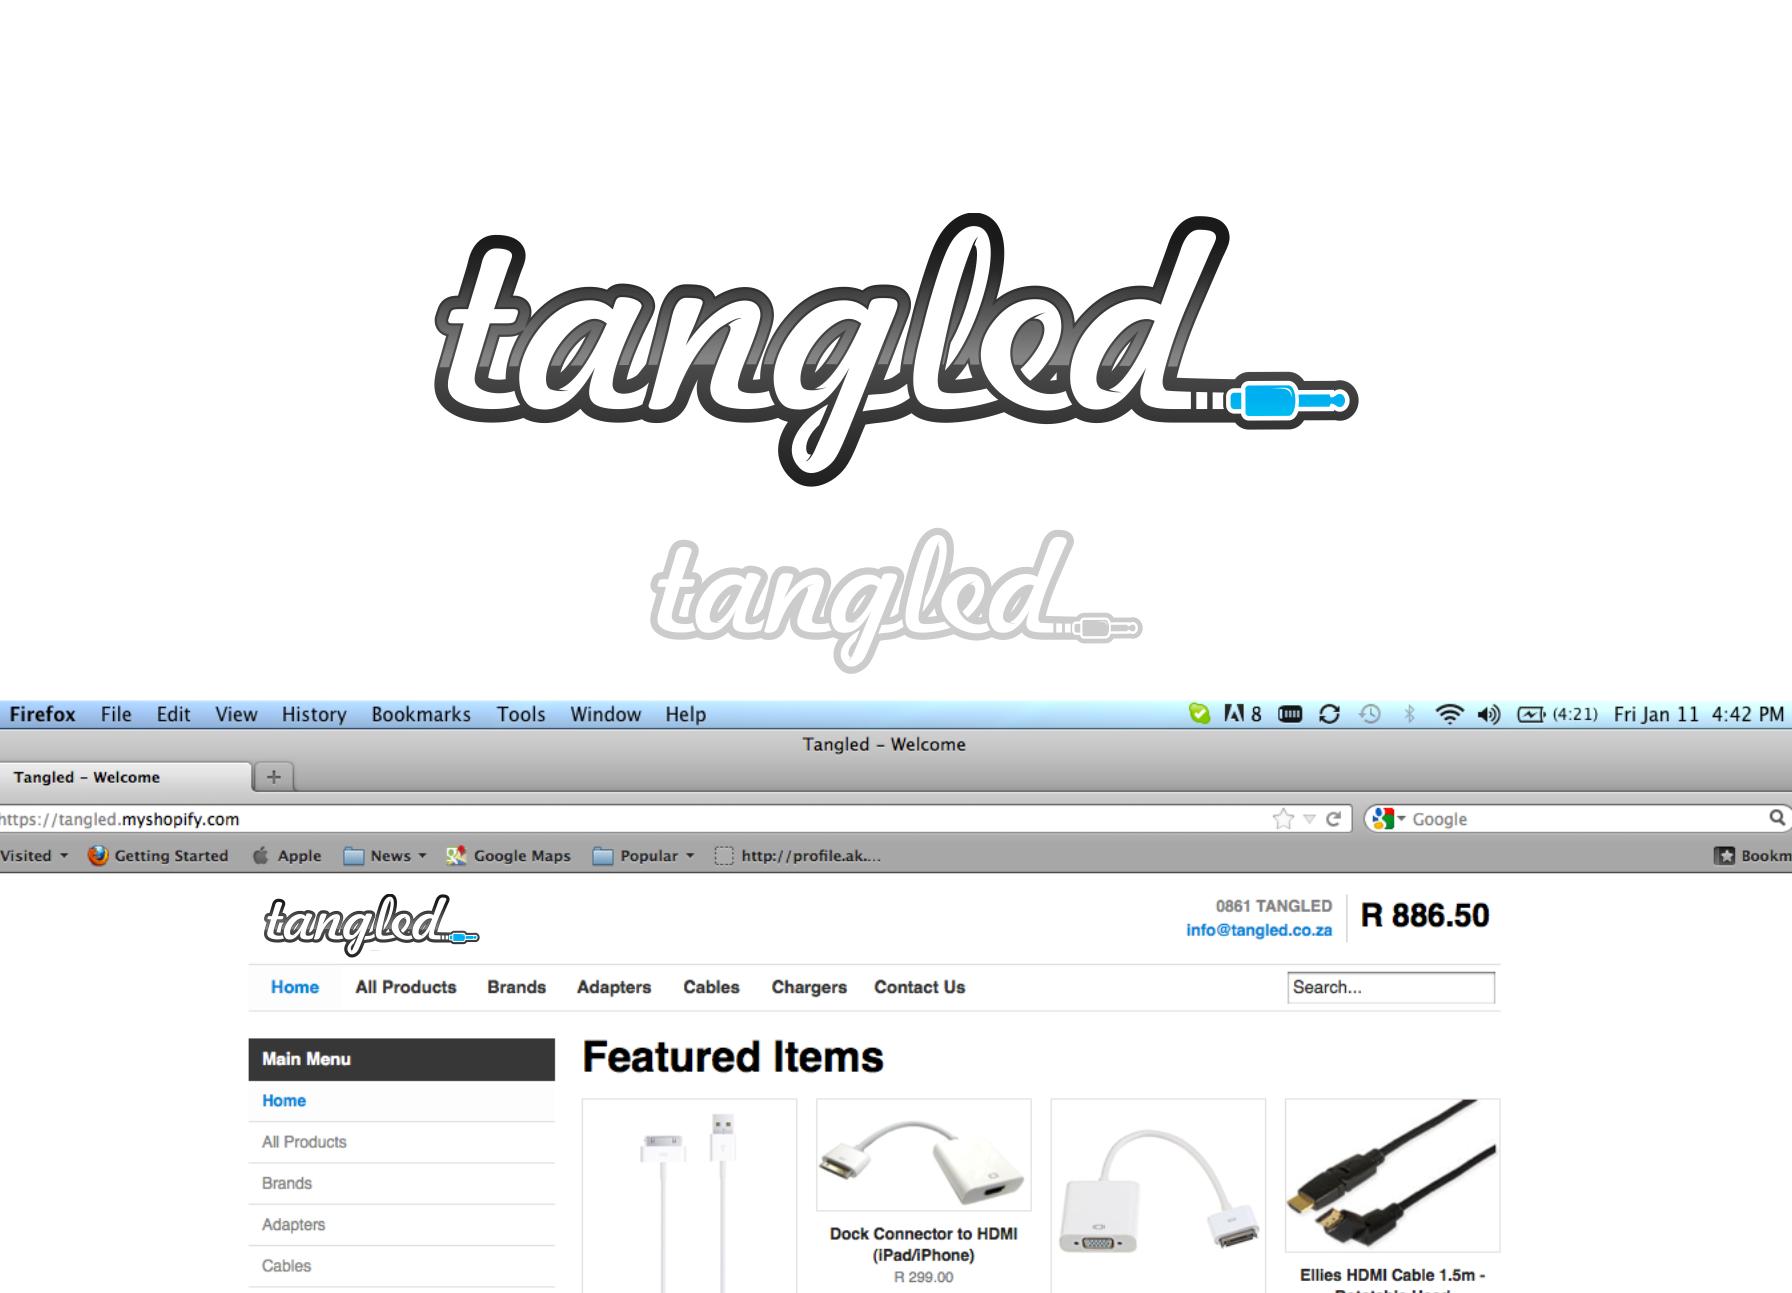 Tangled needs a new logo